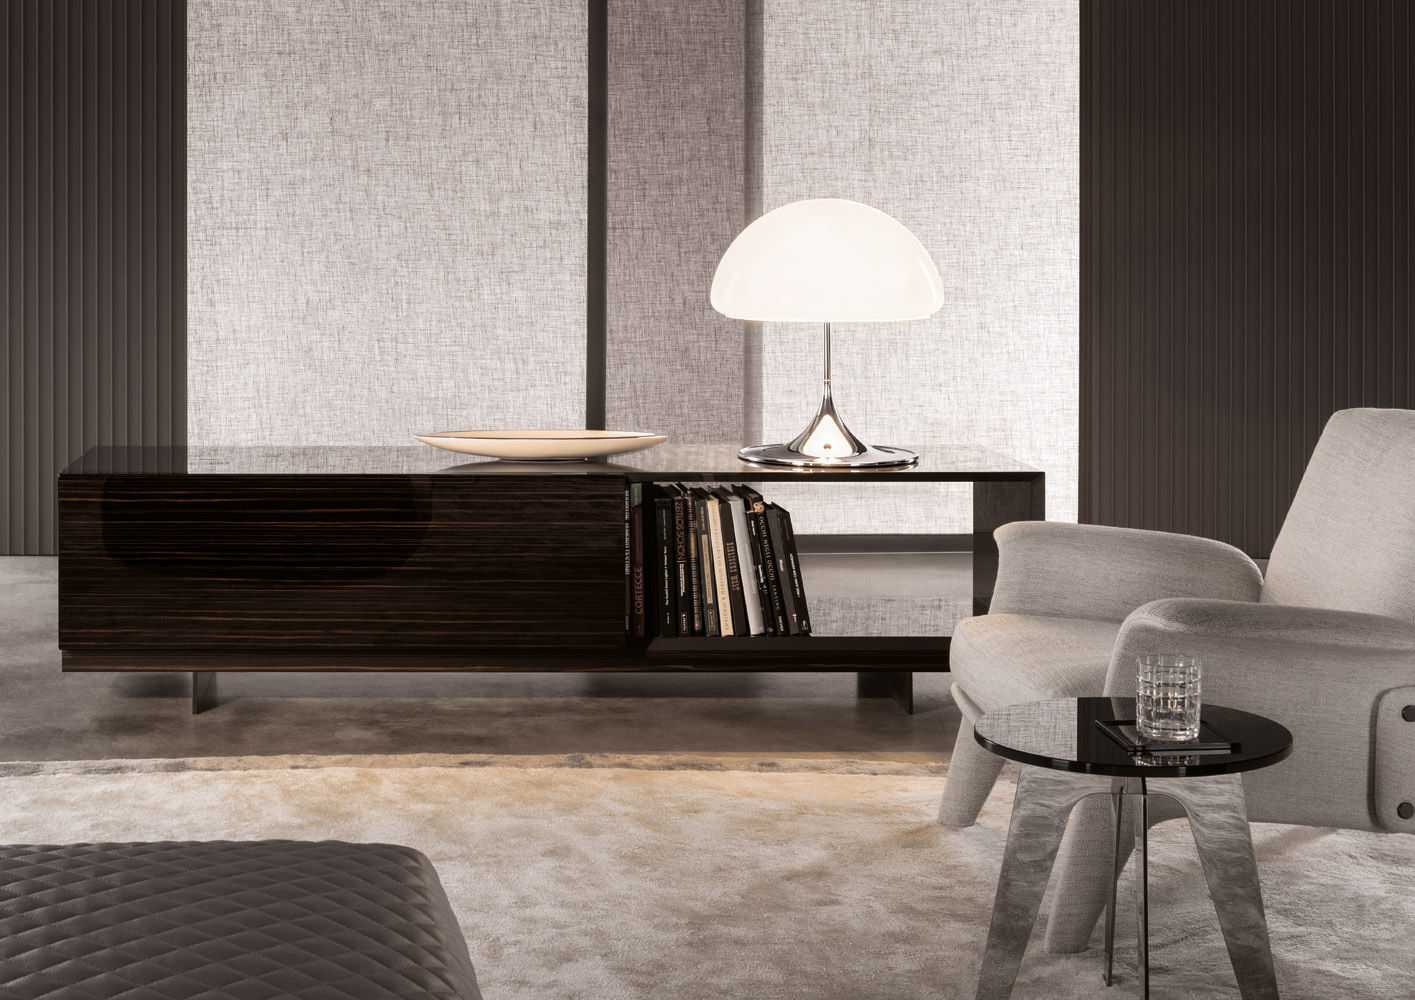 contemporary-sideboard-rodolfo-dordoni-11241-7259353.jpg